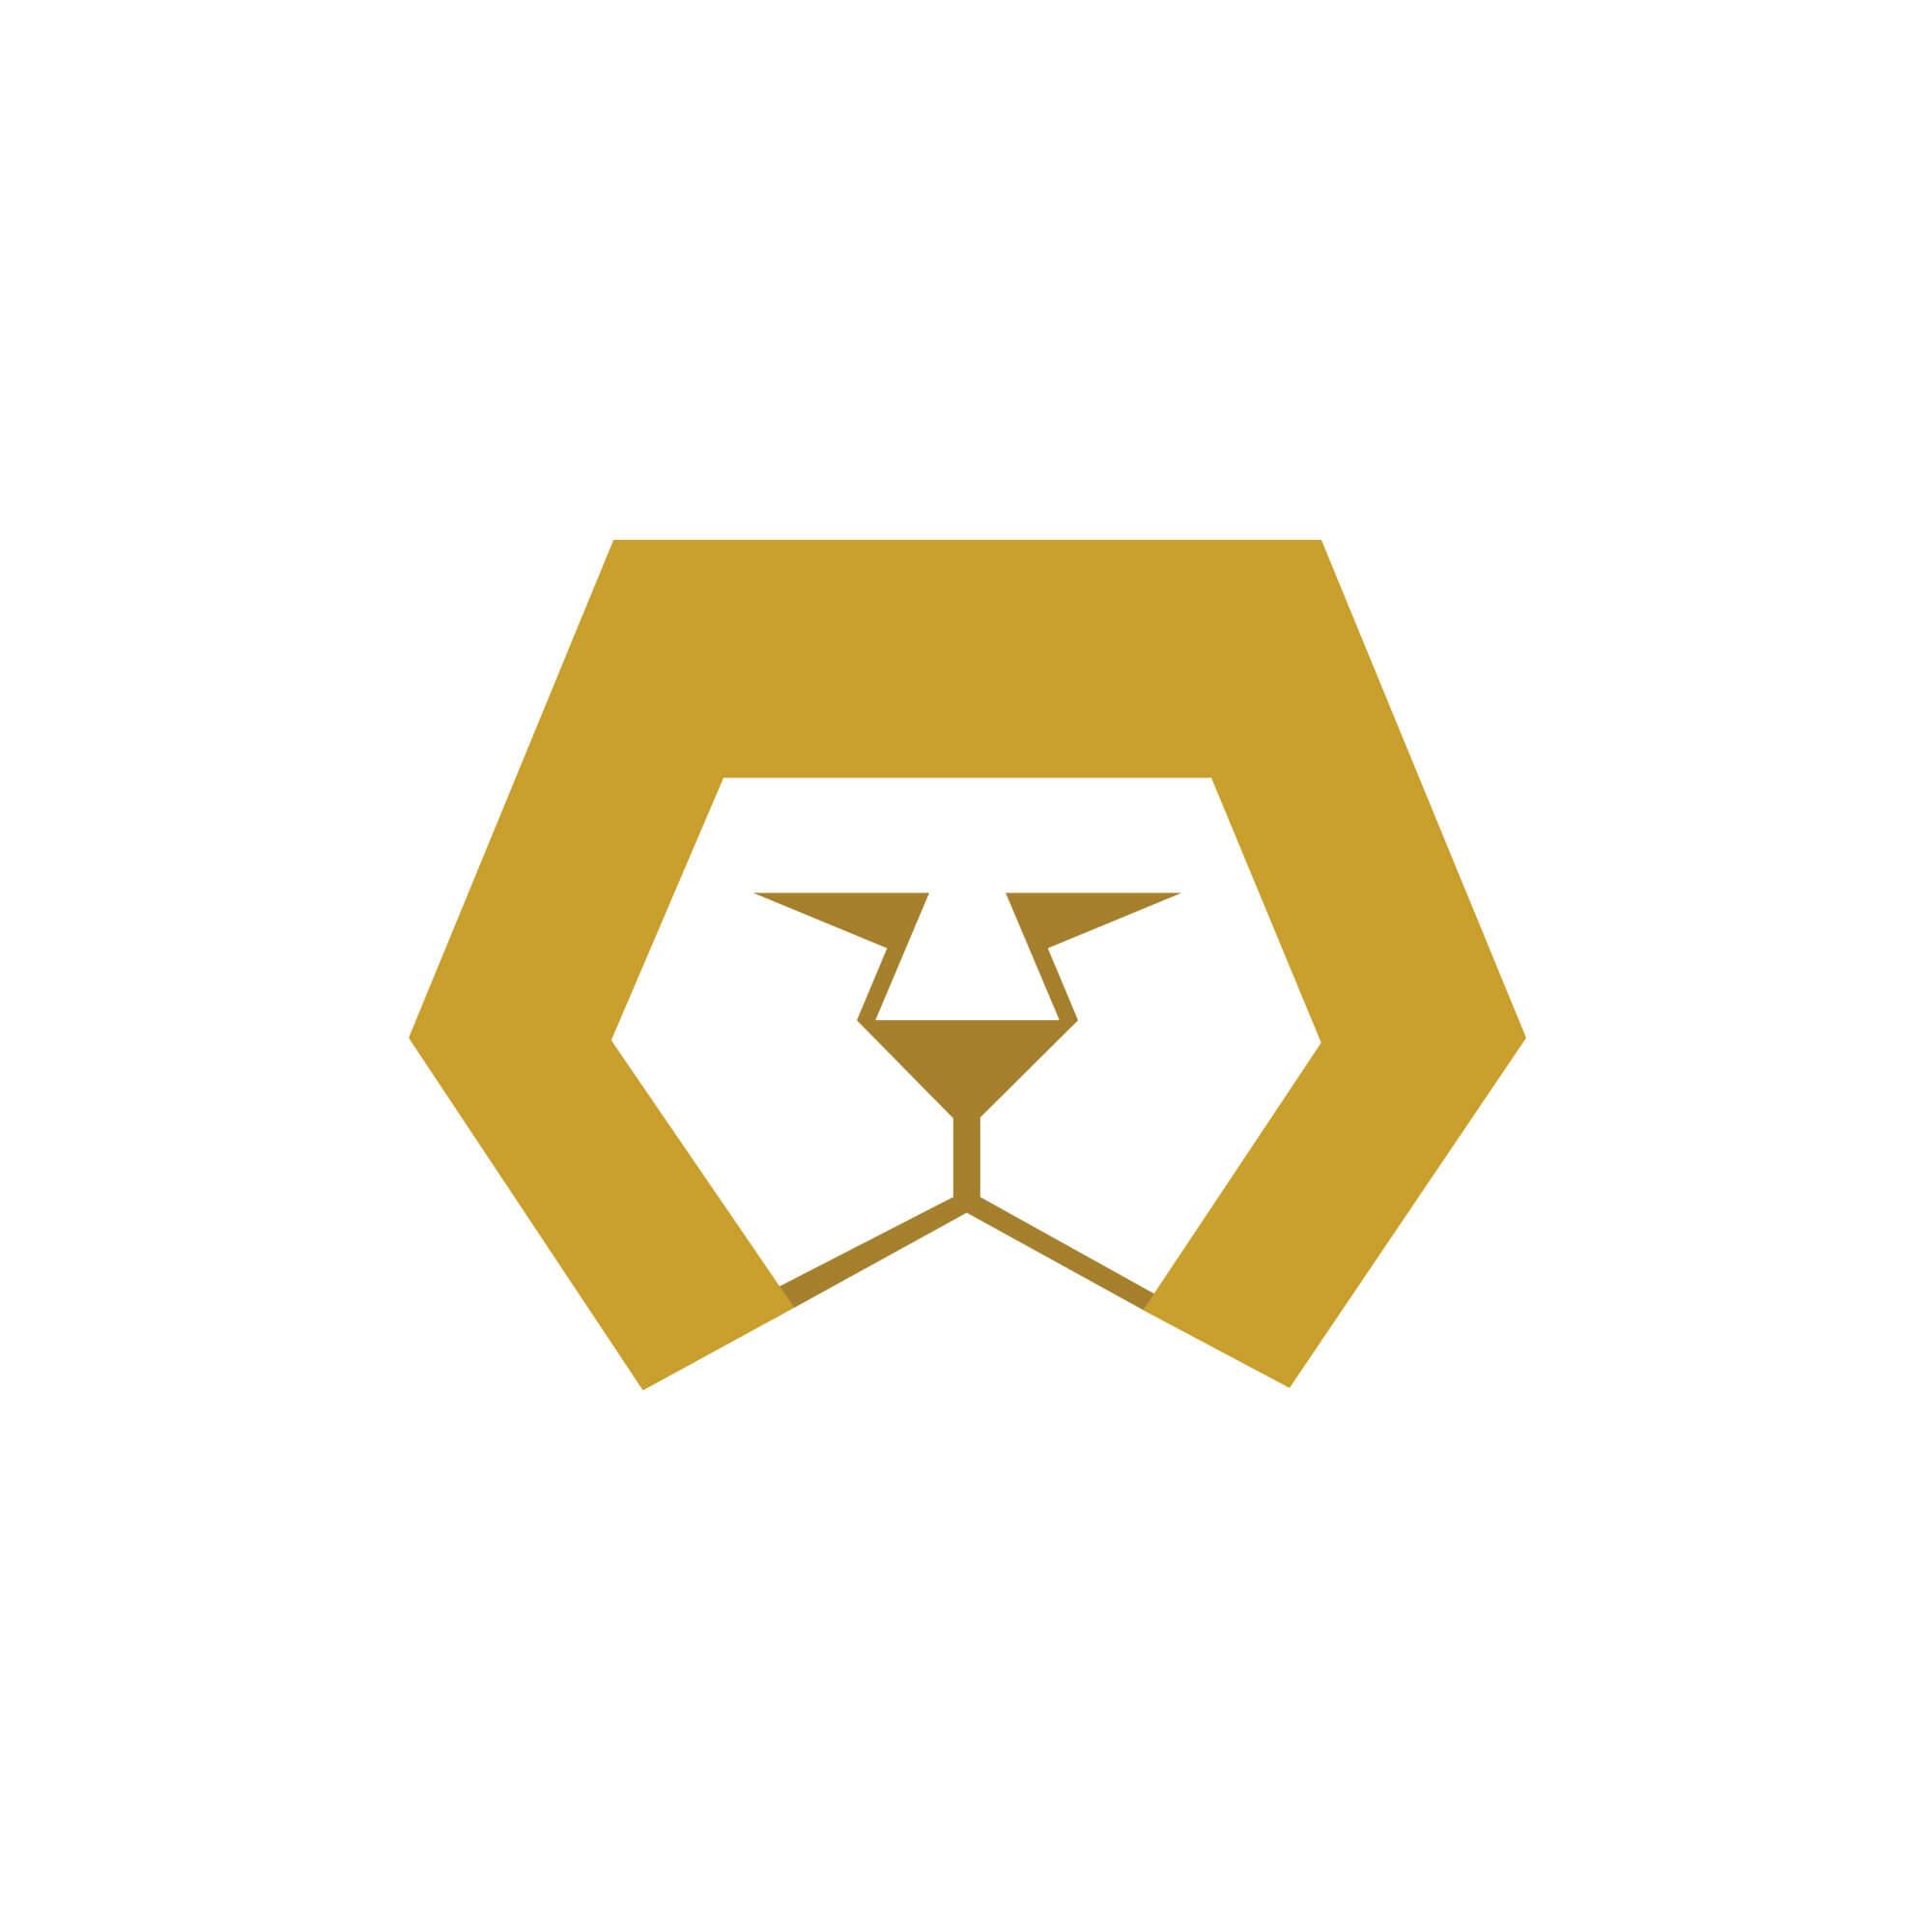 logos_0003_yesman